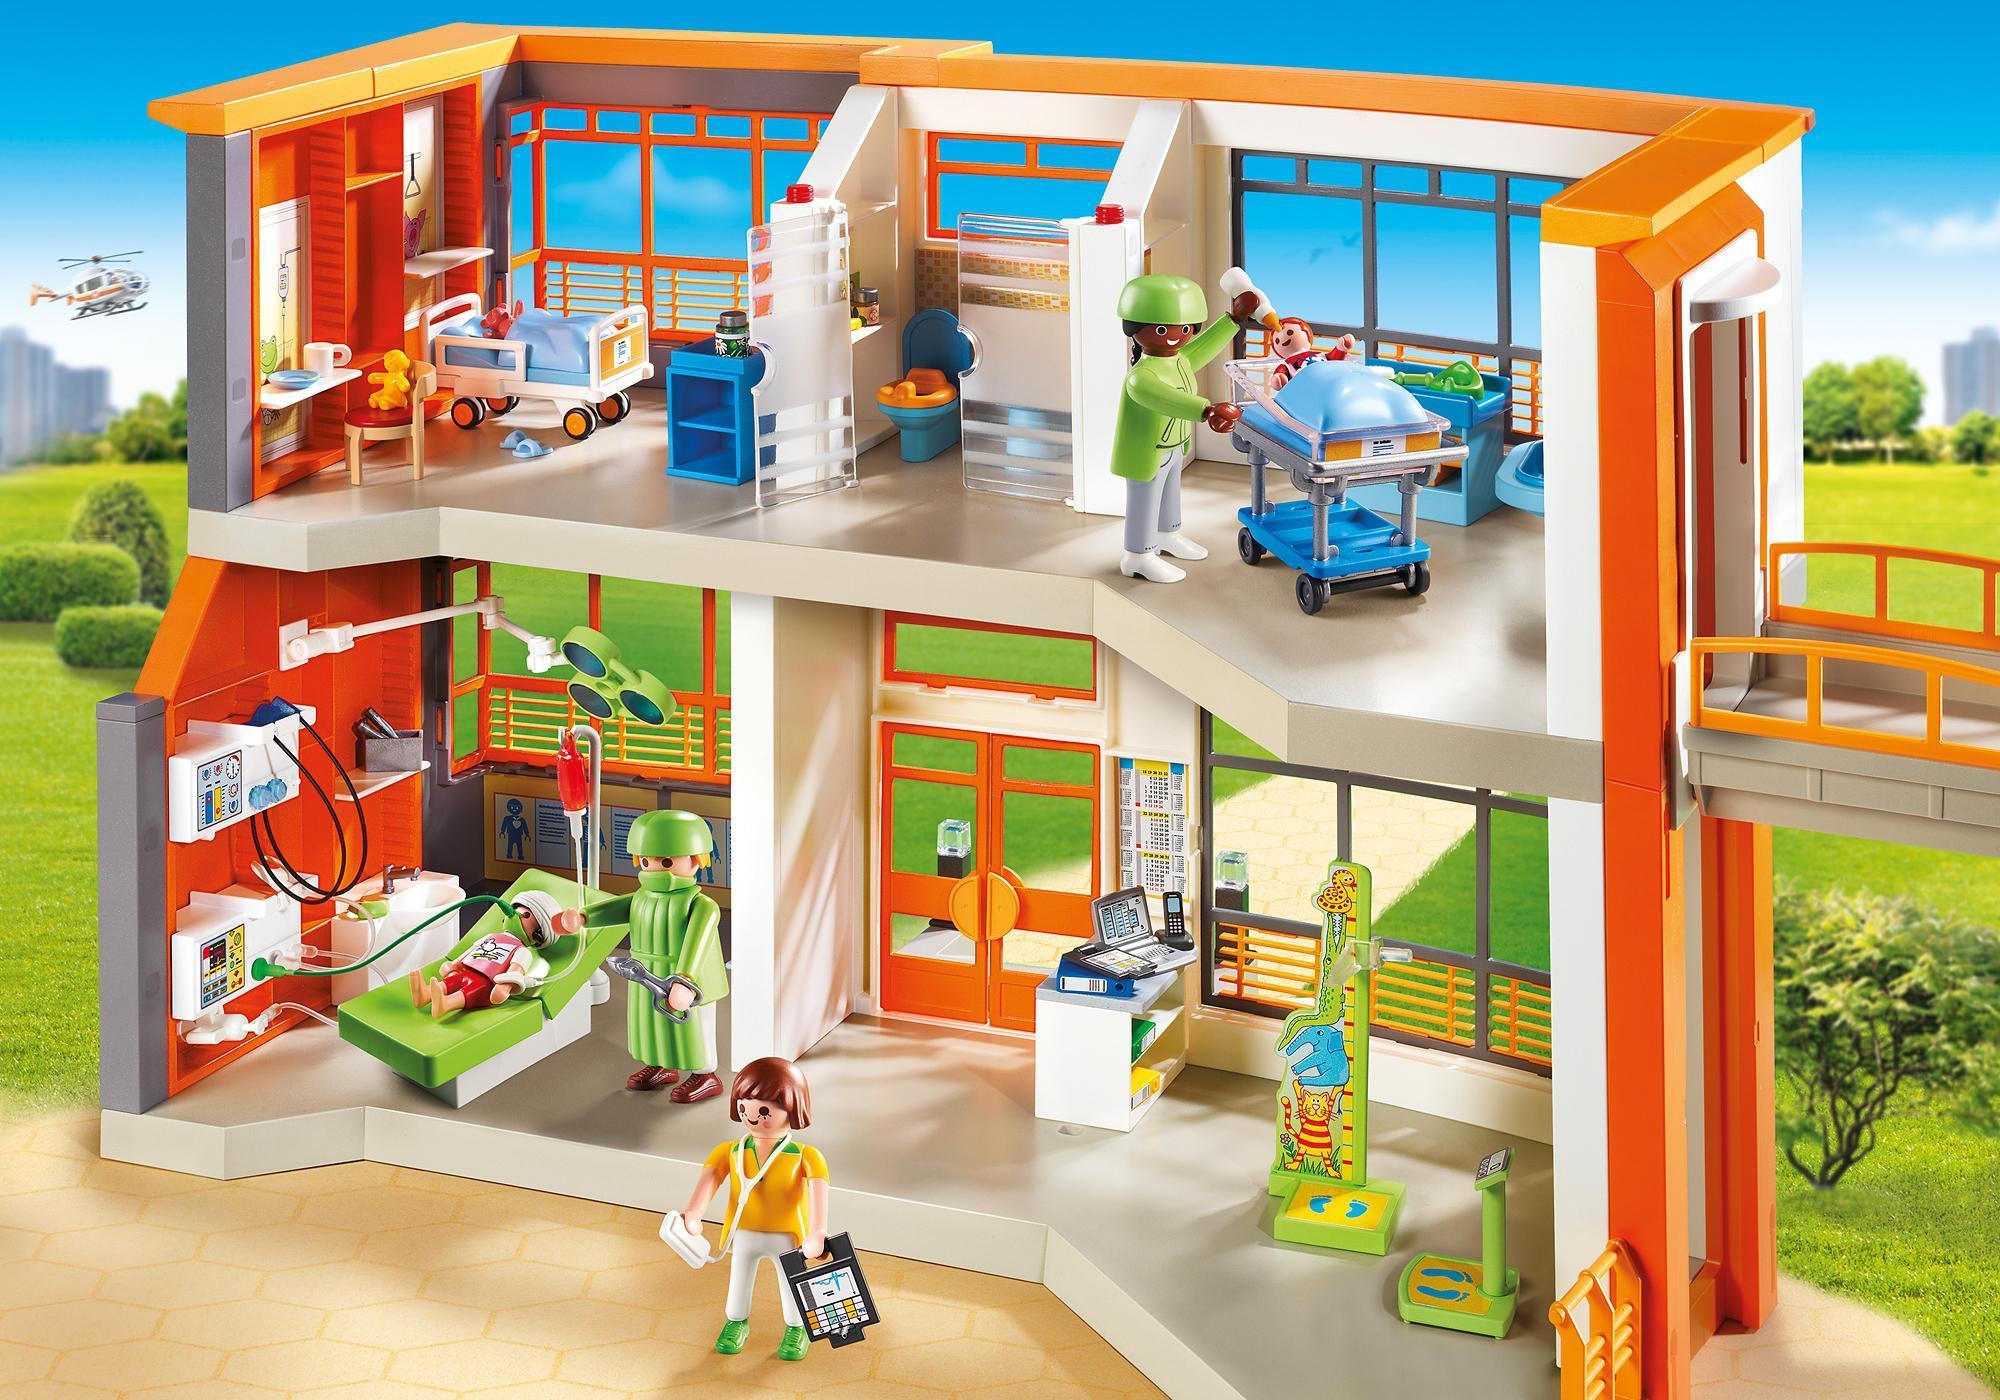 http://media.playmobil.com/i/playmobil/6657_product_detail/Furnished Children's Hospital